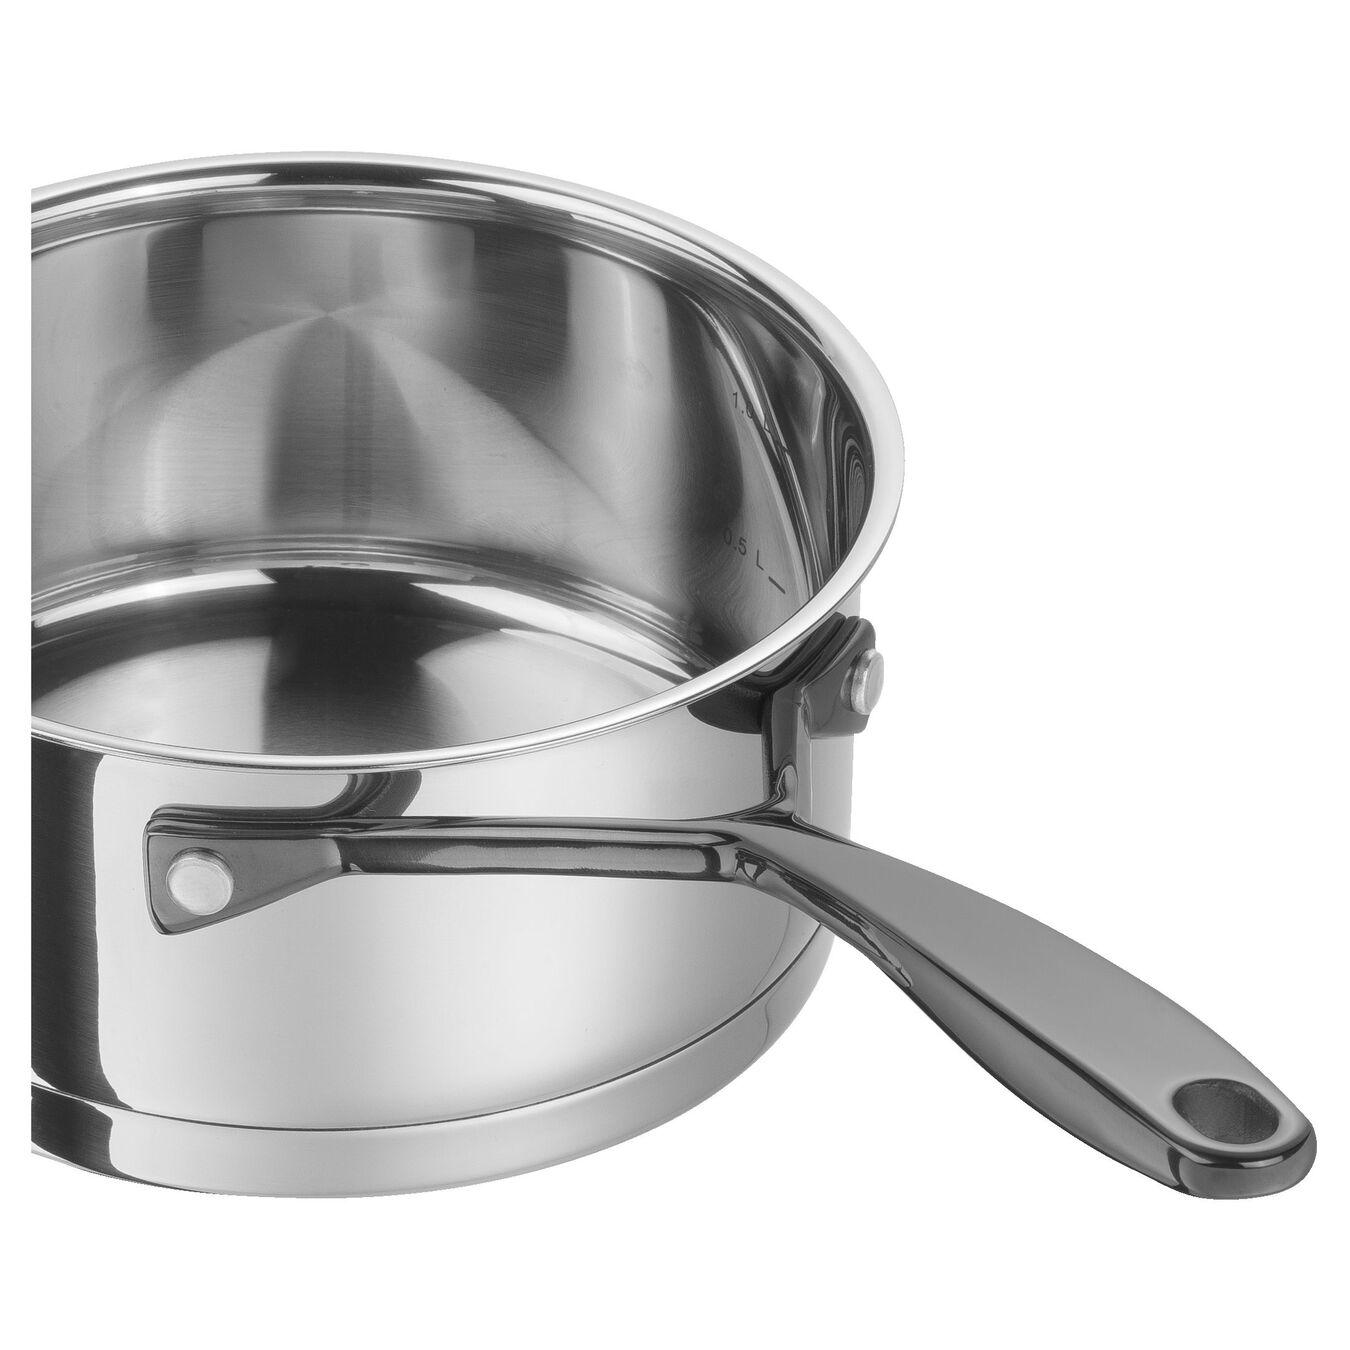 5 Piece Cookware set,,large 6